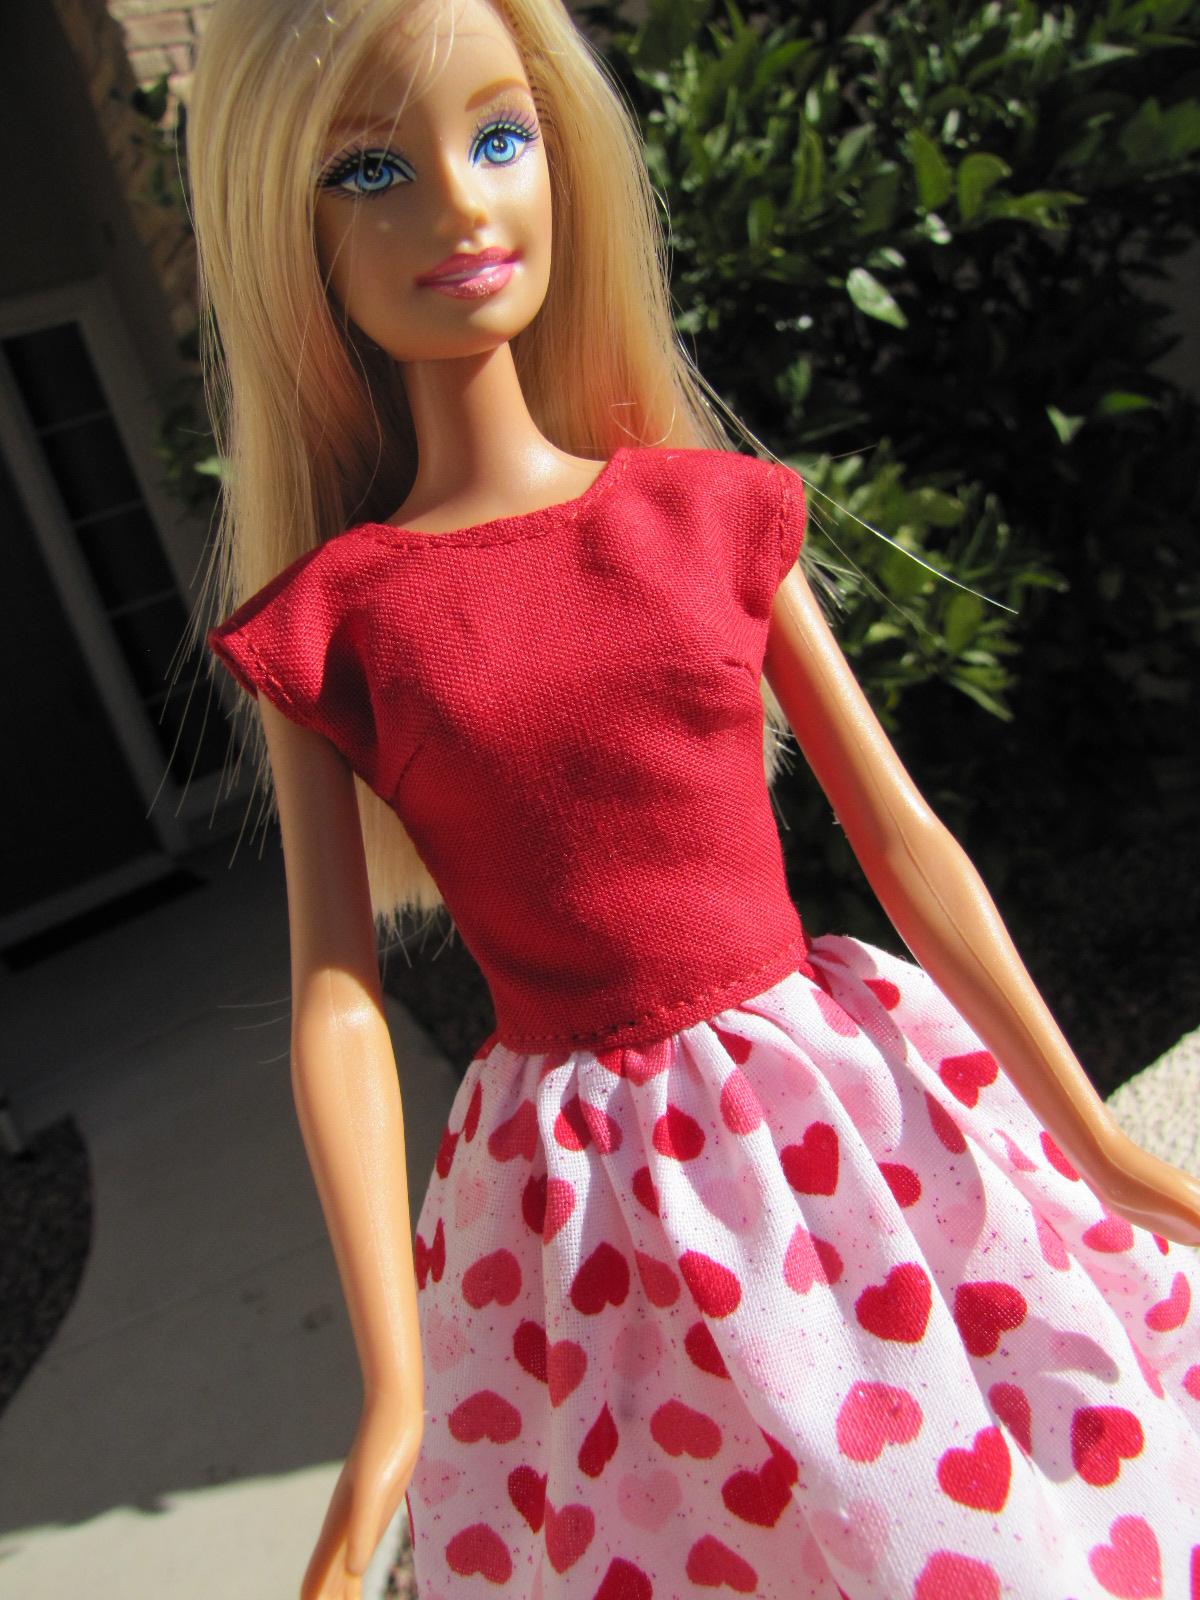 modest barbie style: valentine's day darling, Ideas